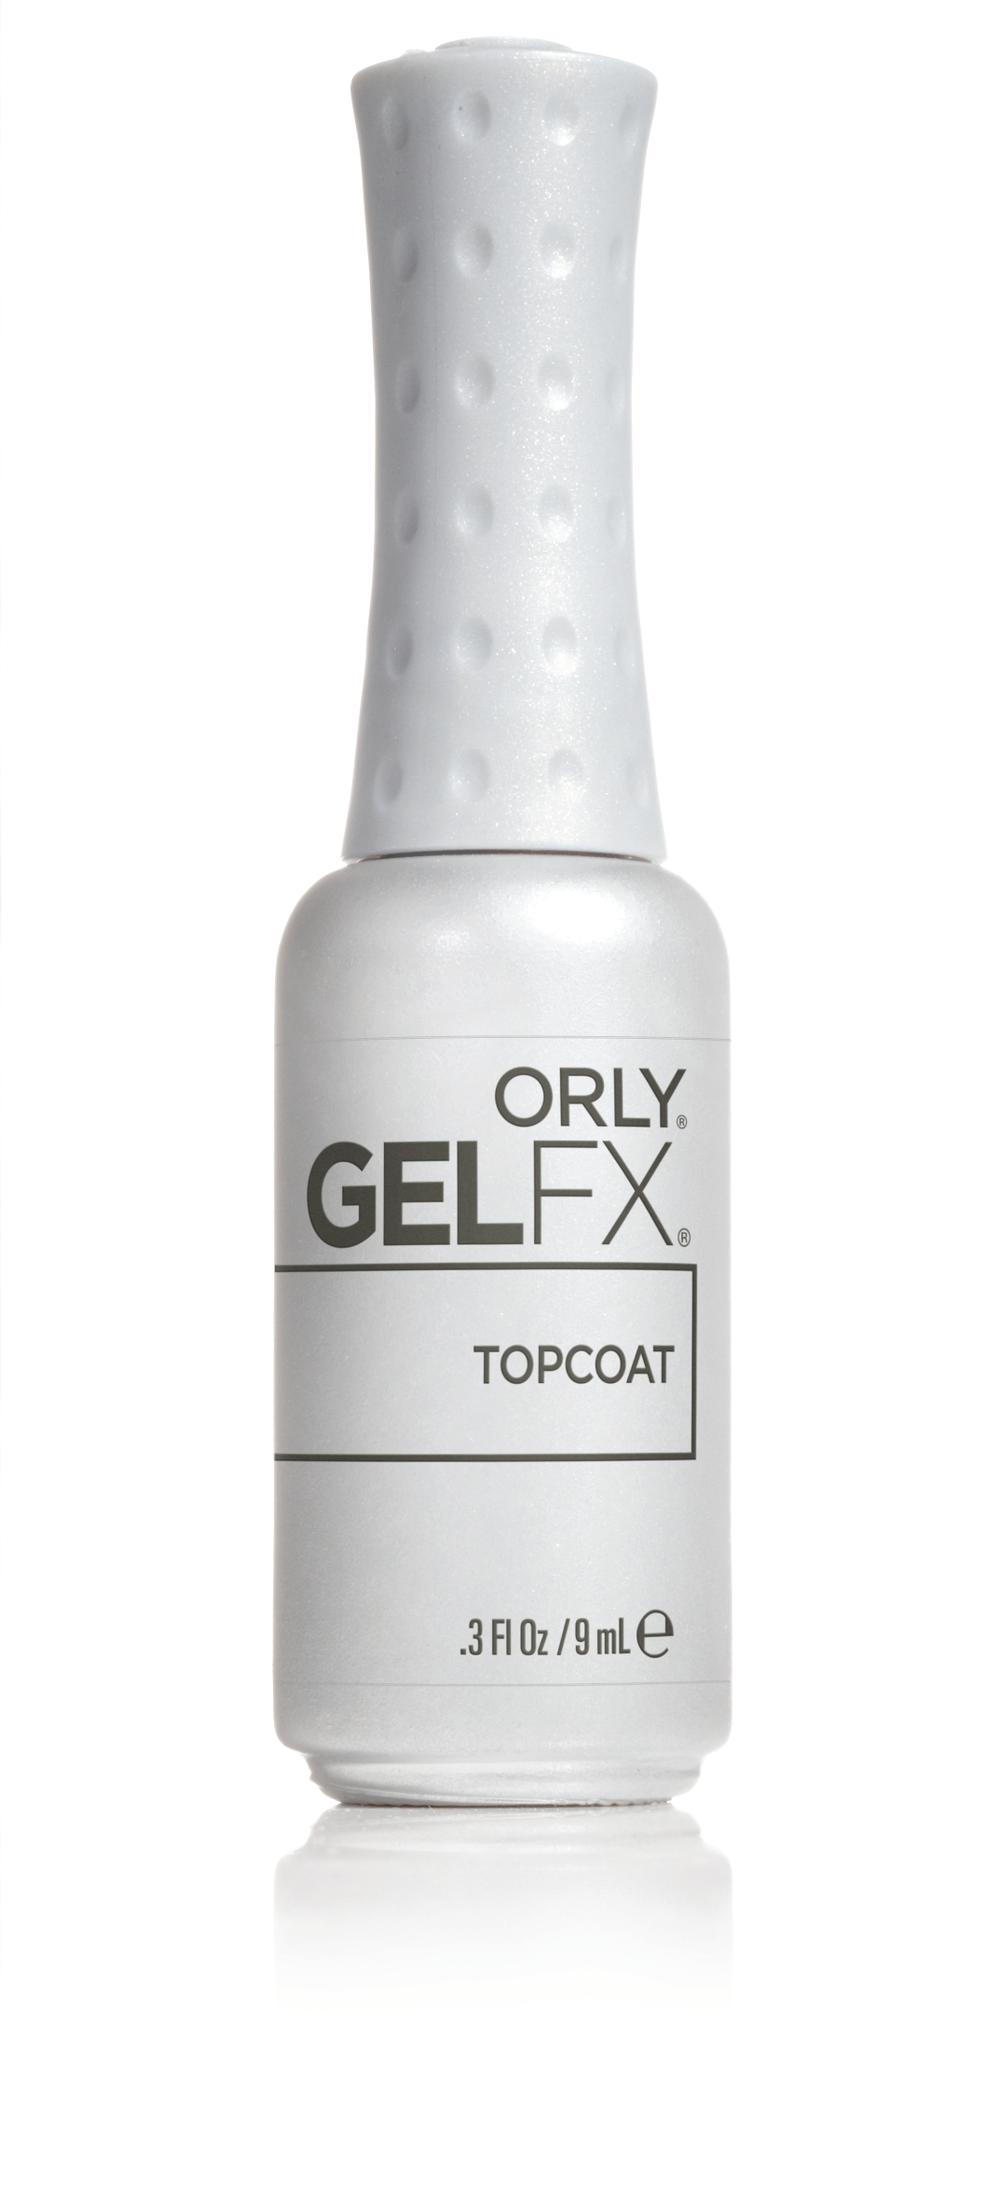 "<p>Orly GelFX Top Coat </p> <p><a href=""http://www.orlybeauty.com"">www.orlybeauty.com </a></p>"